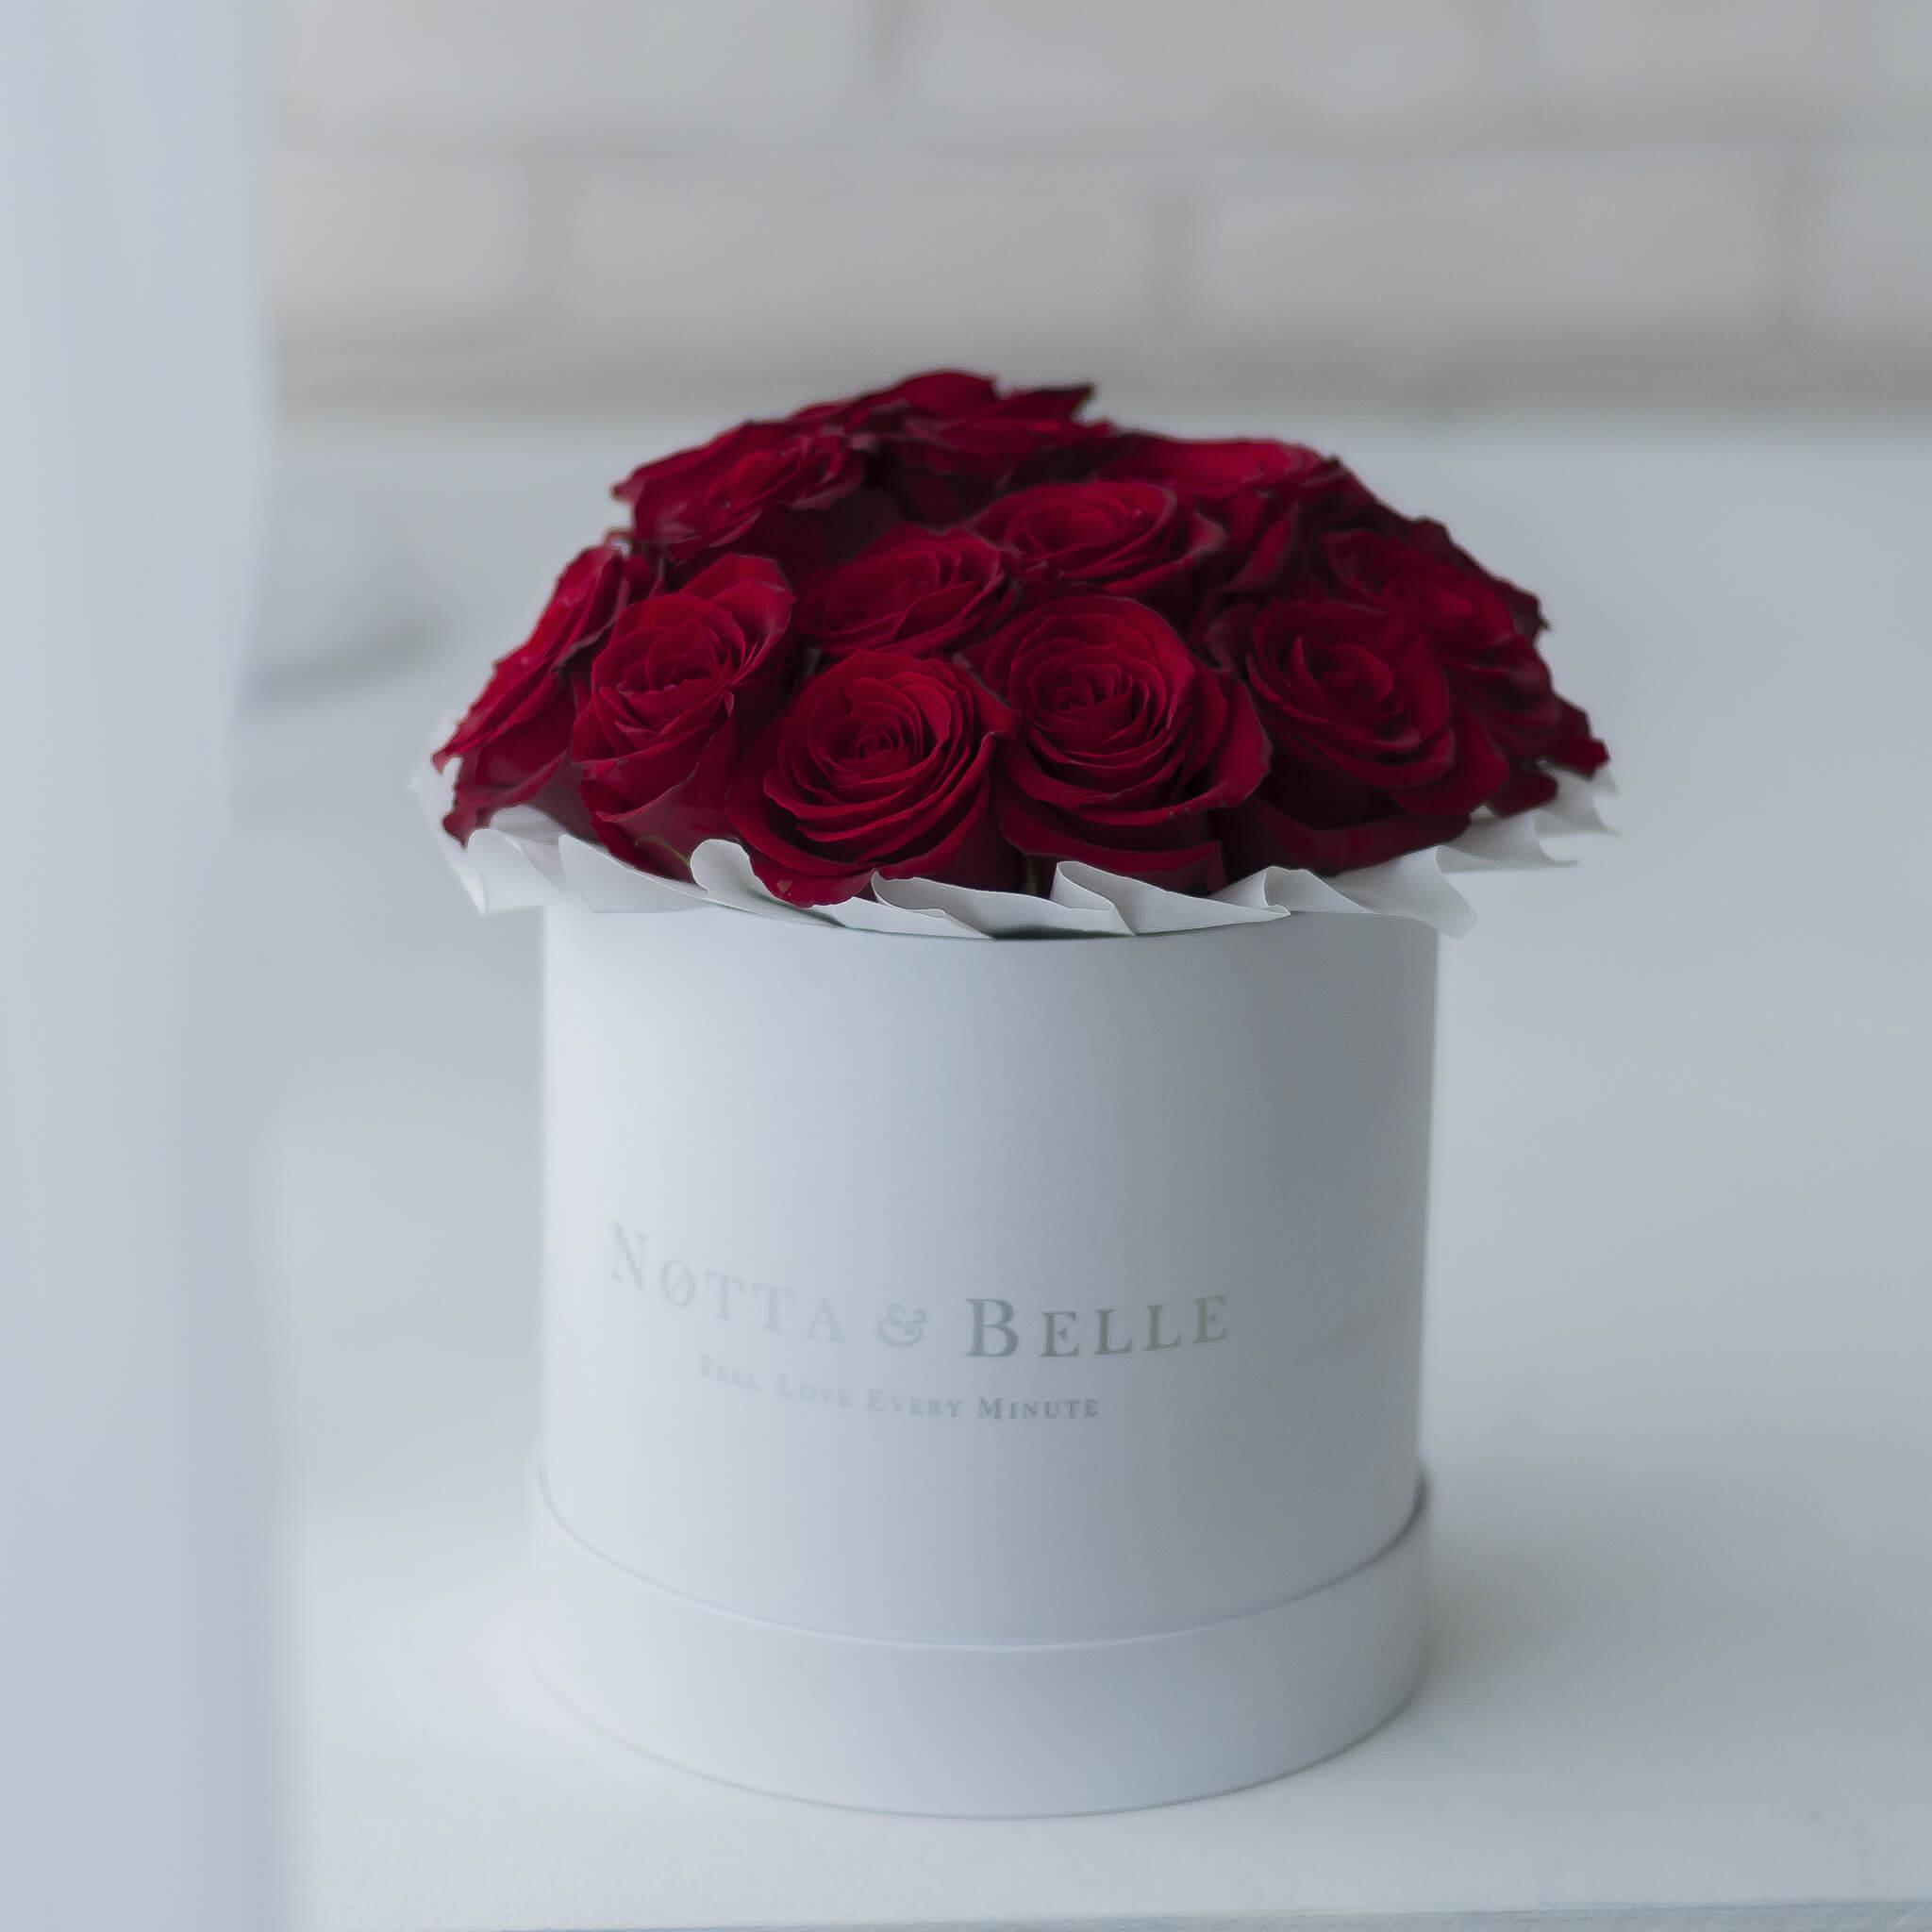 Mini Красная роза в шляпной коробке белого цвета